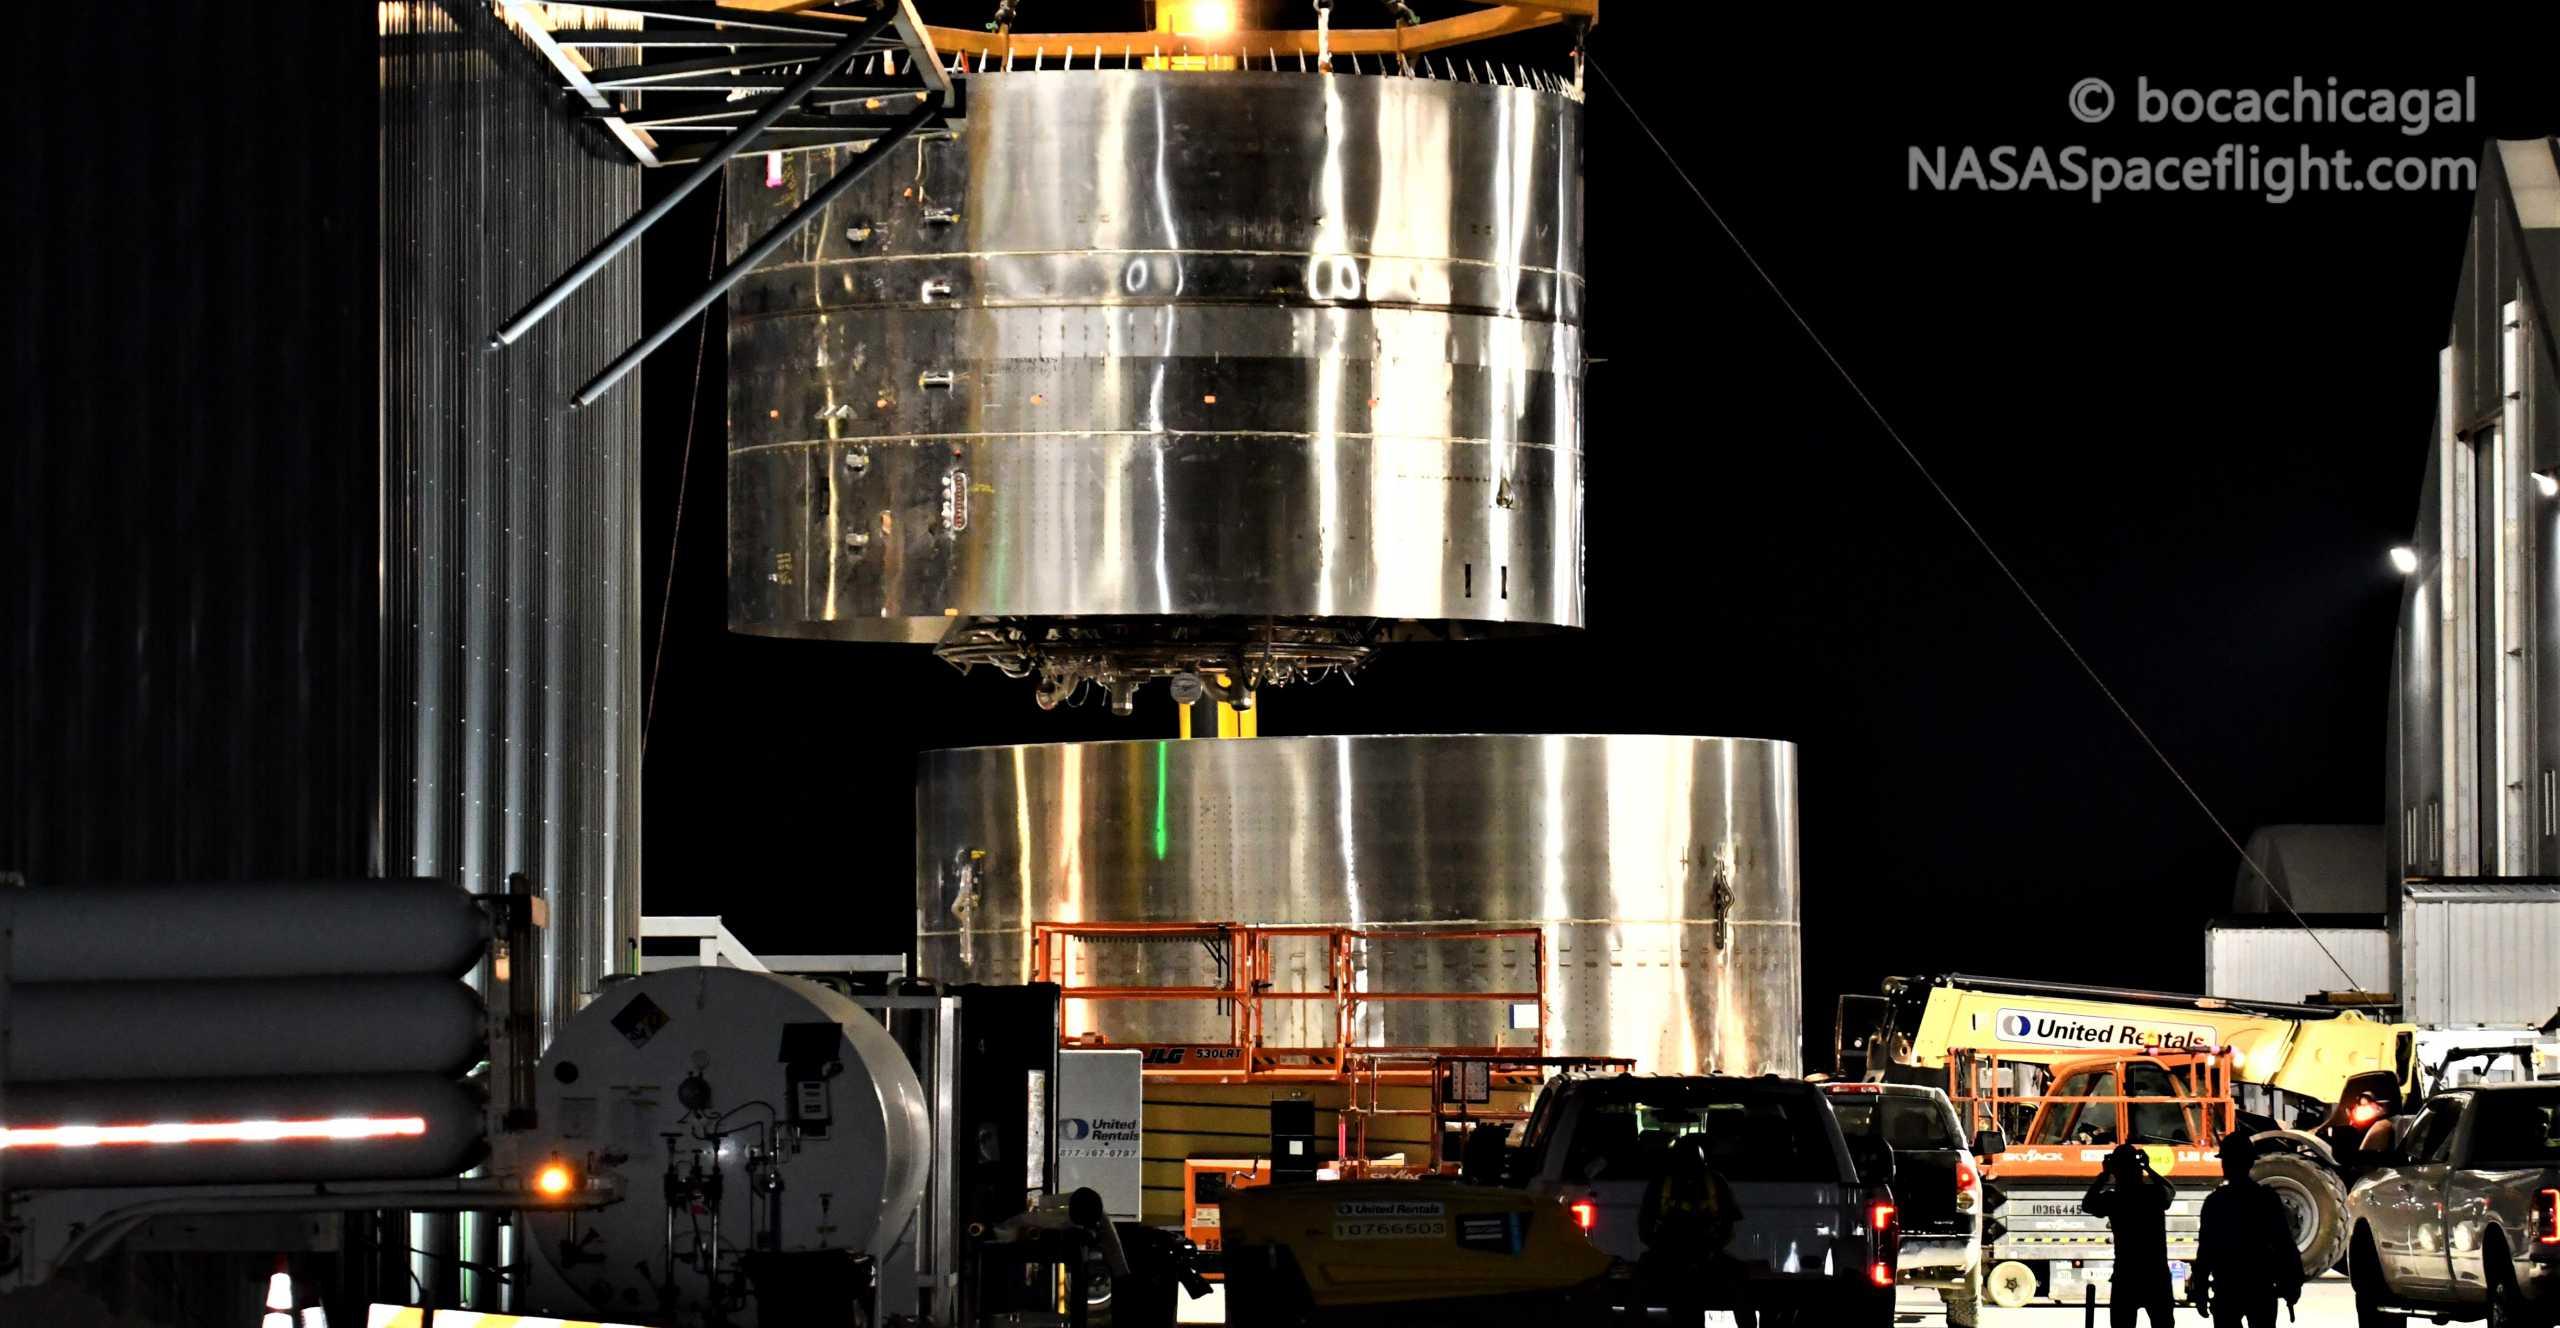 Starship Boca Chica 081920 (NASASpaceflight – bocachicagal) SN8 engine section skirt stack 4 crop (c)